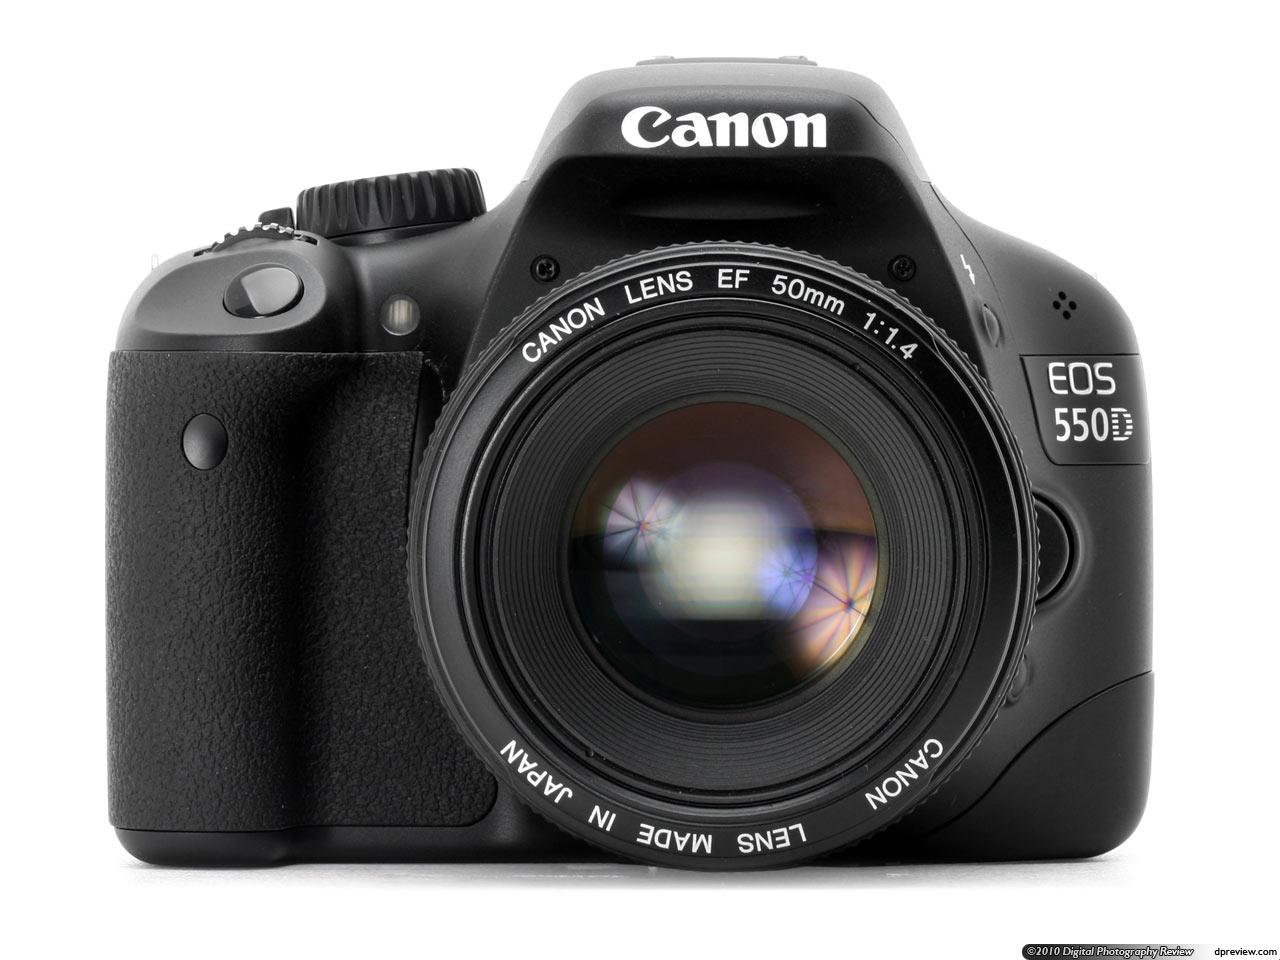 canon eos 550d rebel t2i kiss x4 digital in depth review rh dpreview com canon eos rebel t2 instruction manual Canon EOS Digital Rebel